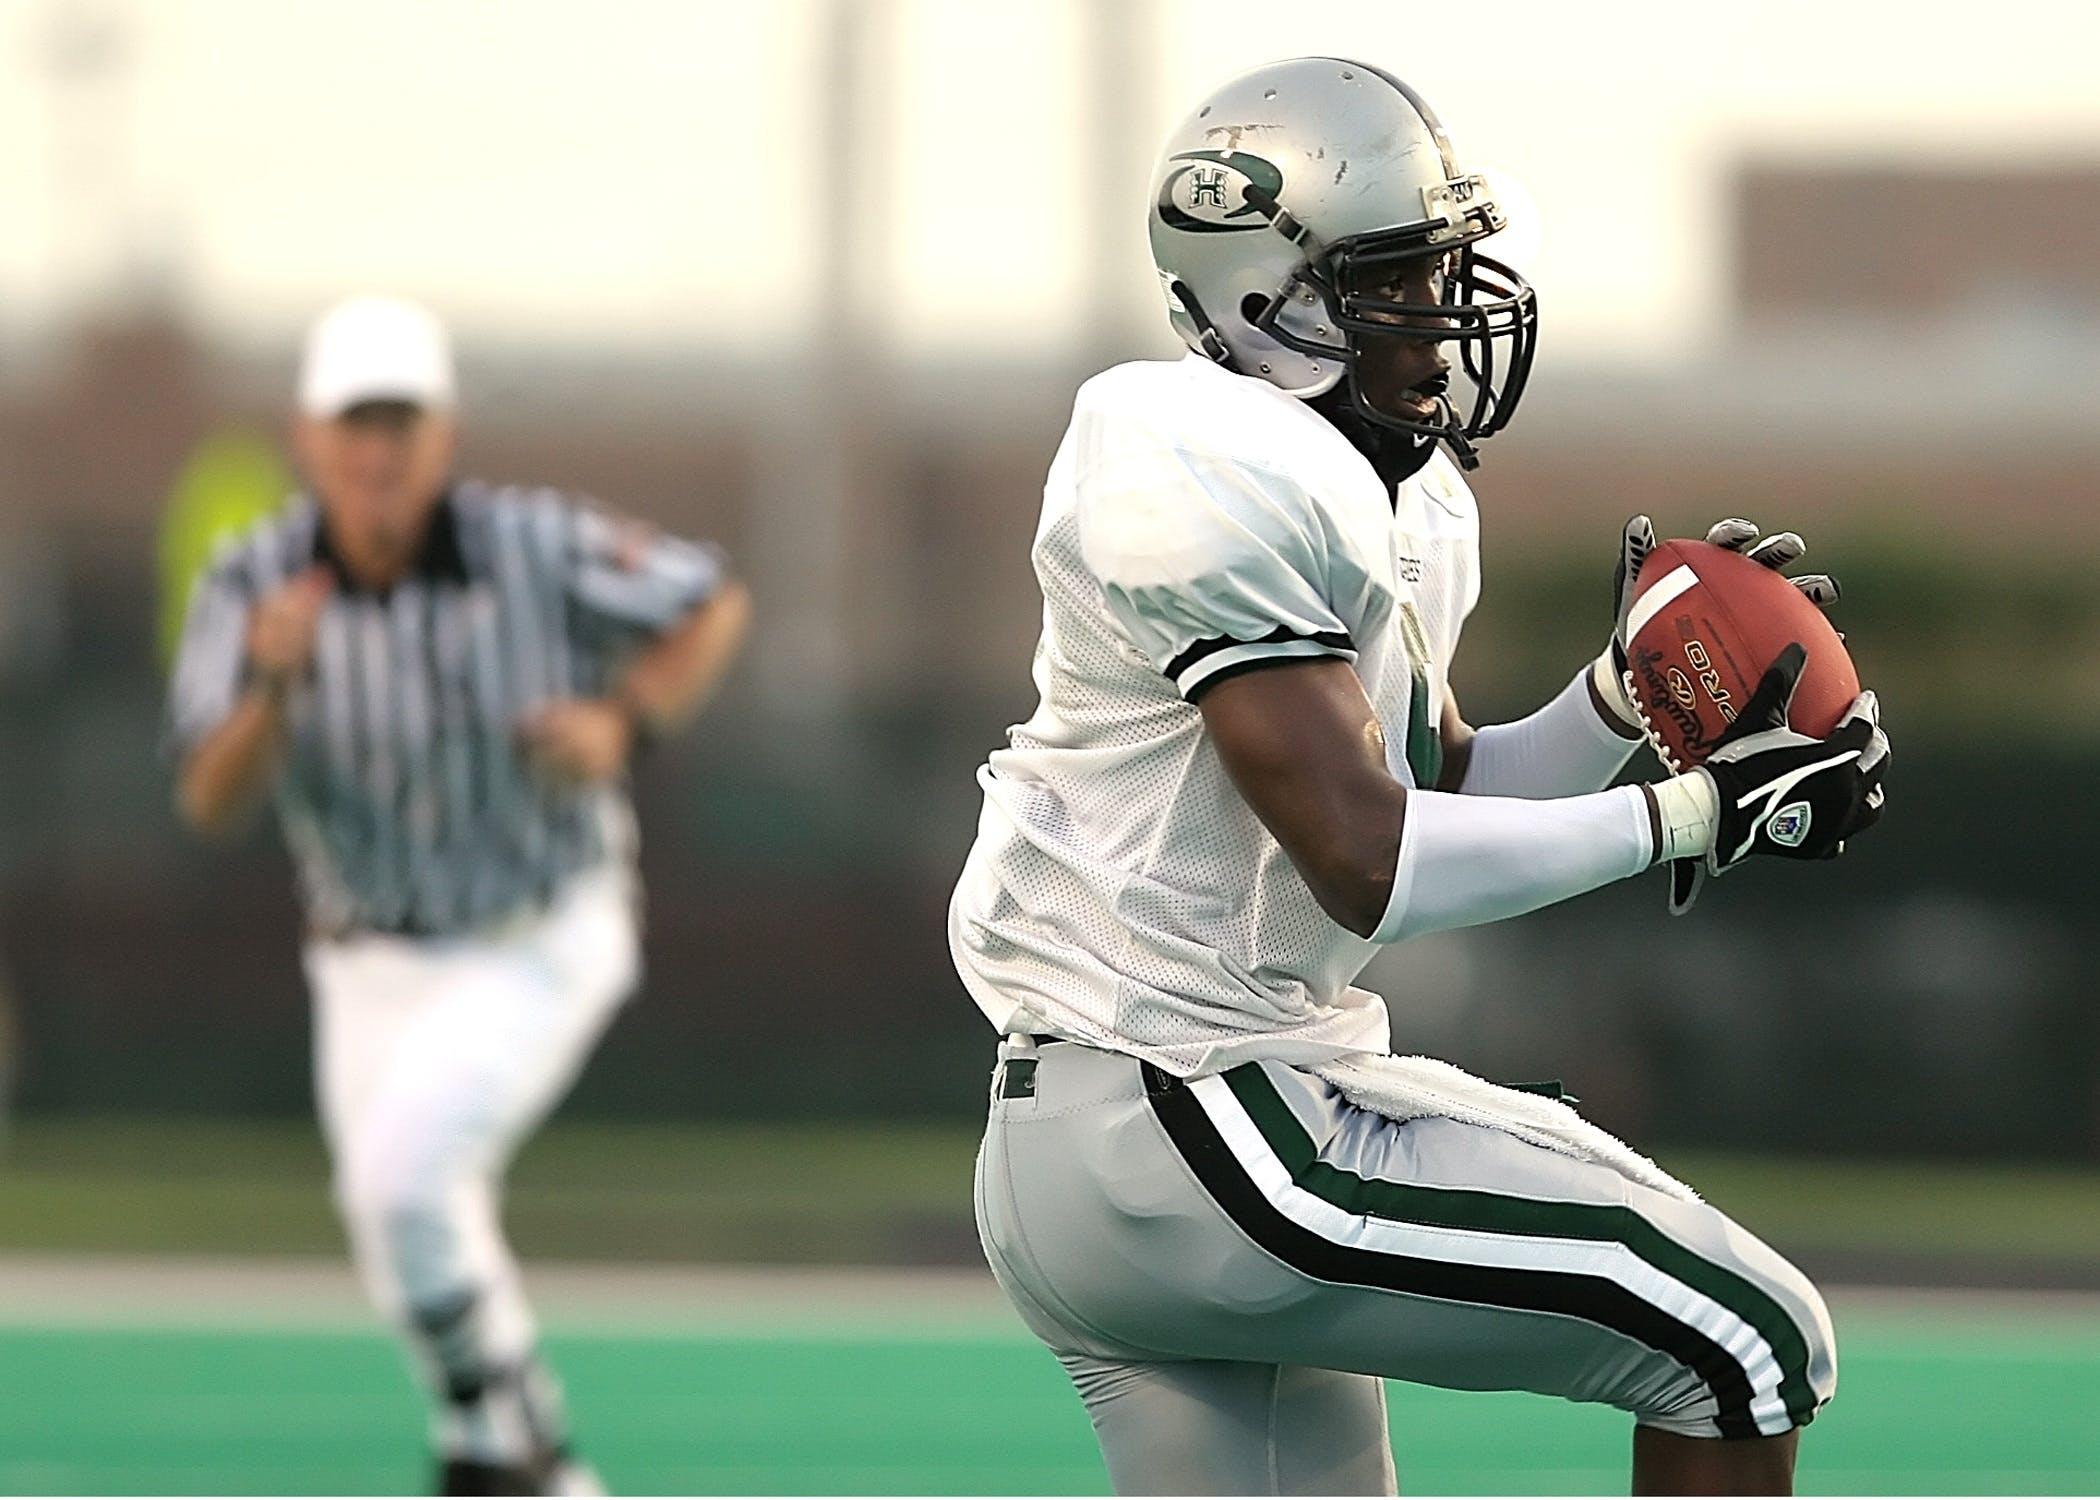 action, aktion, american football